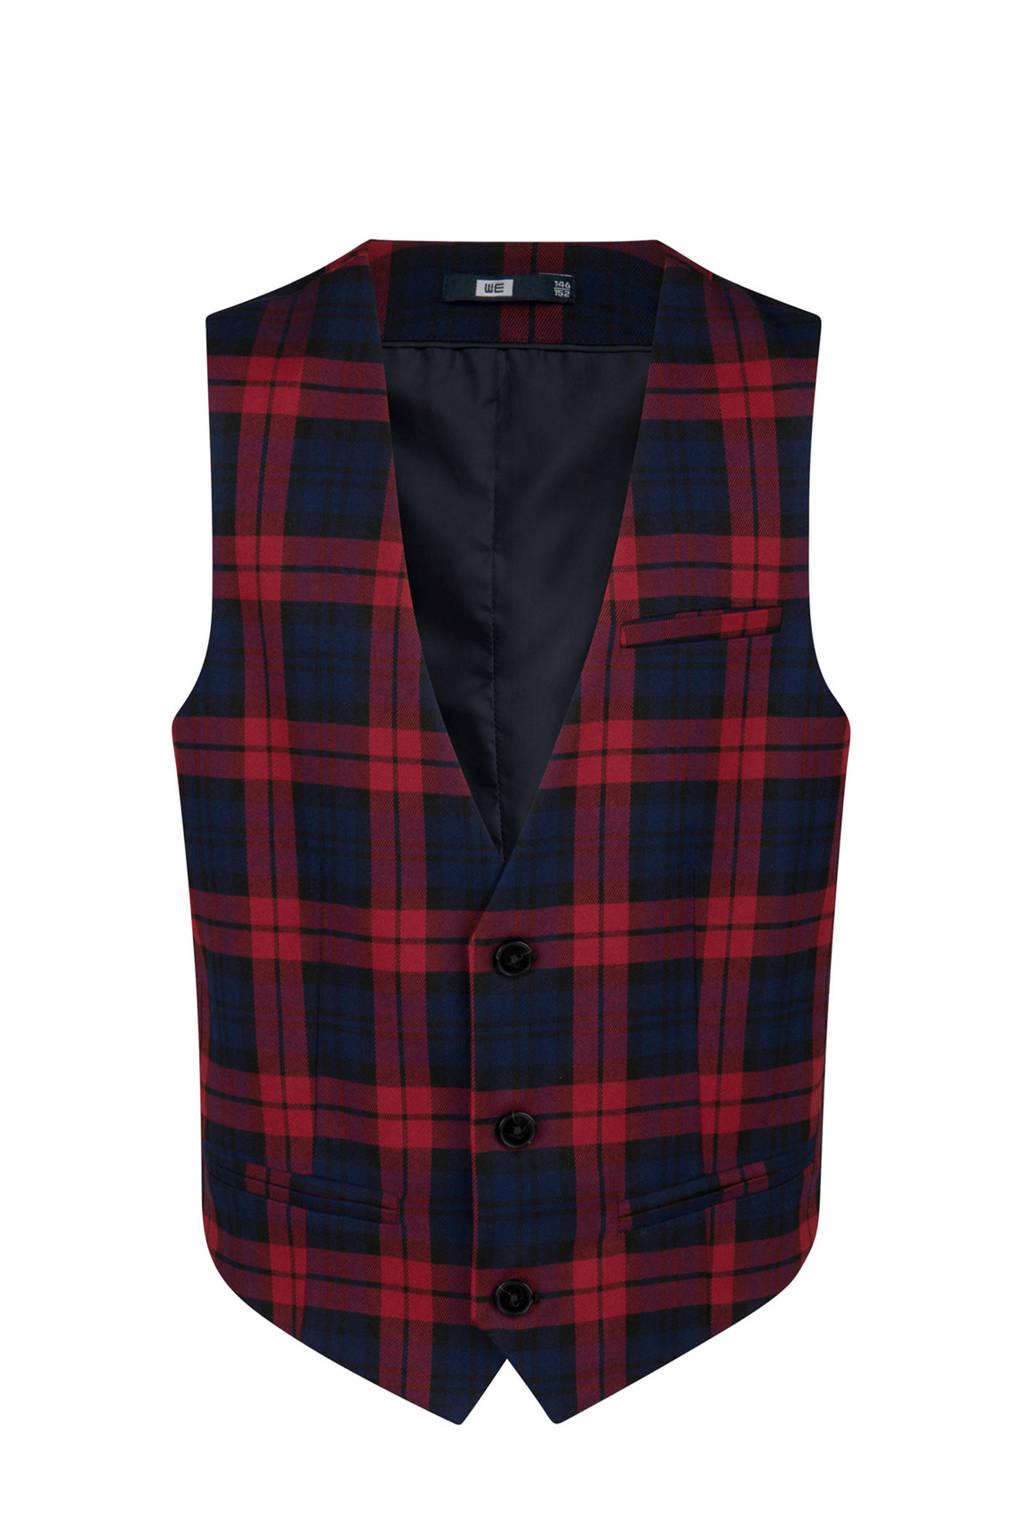 WE Fashion geruit gilet rood, rood/ zwart